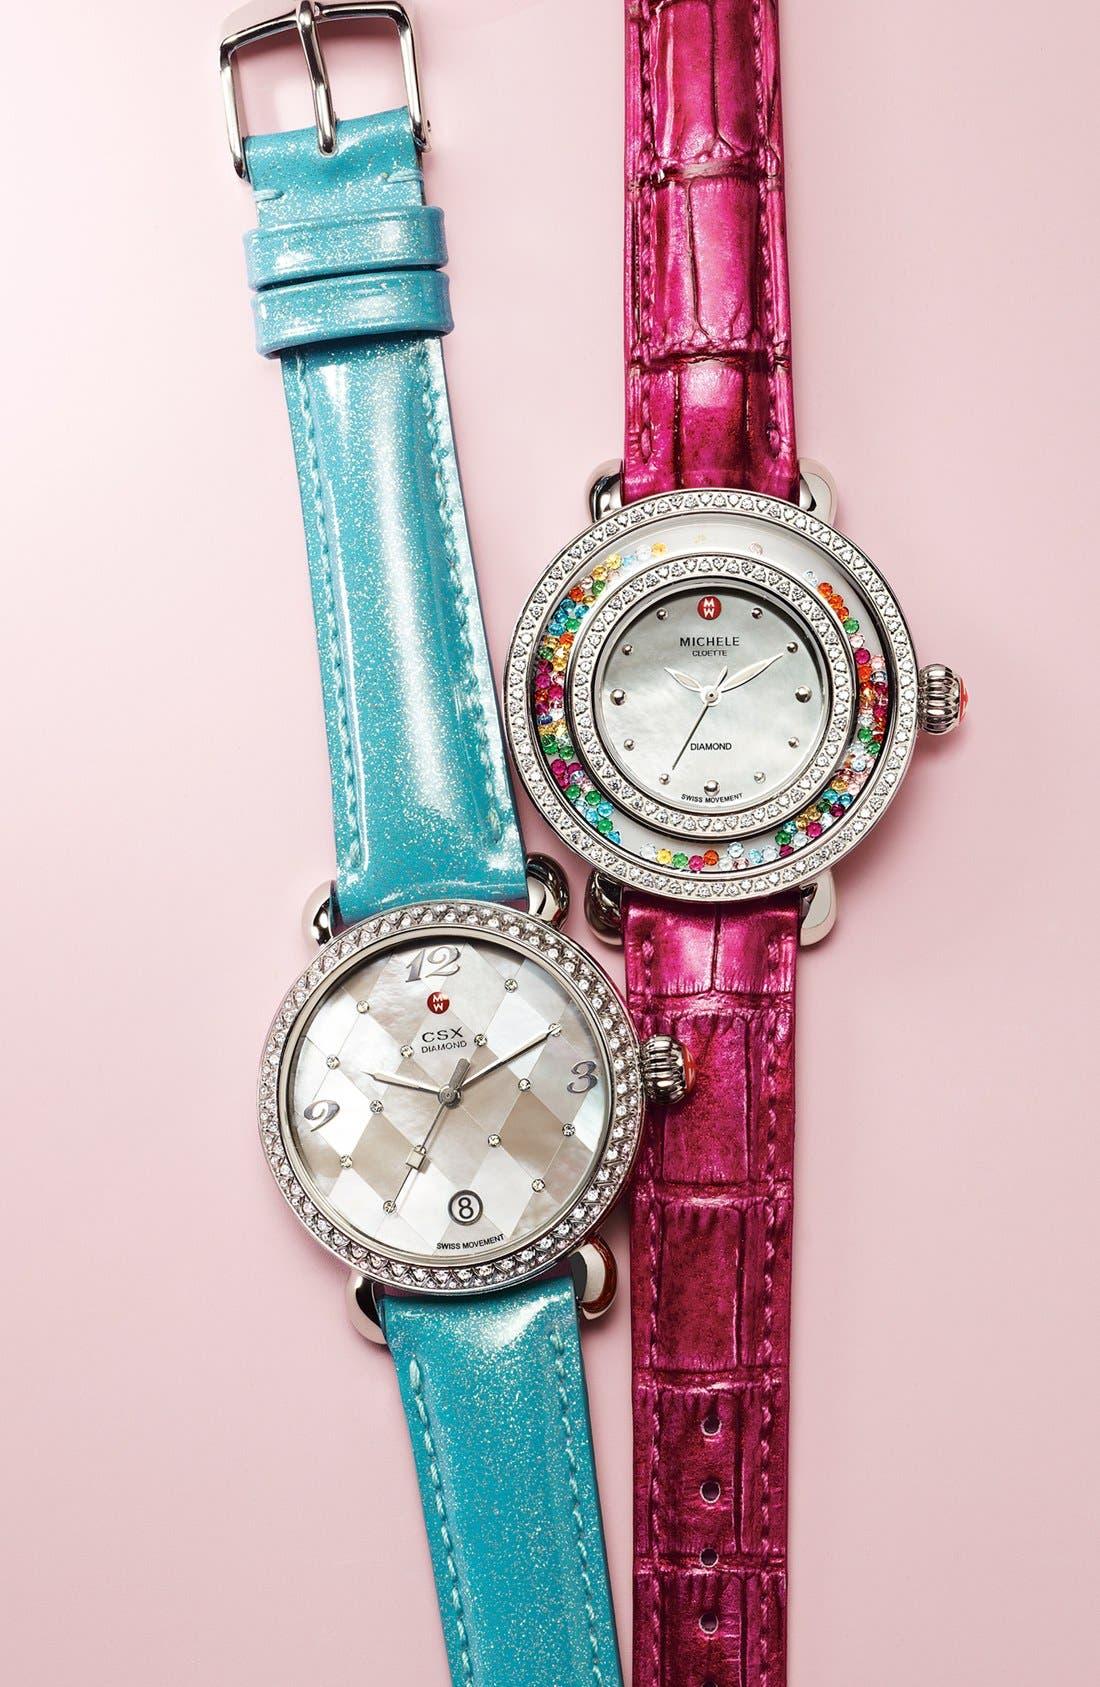 Alternate Image 1 Selected - MICHELE 'Cloette Carnival' Customizable Watch